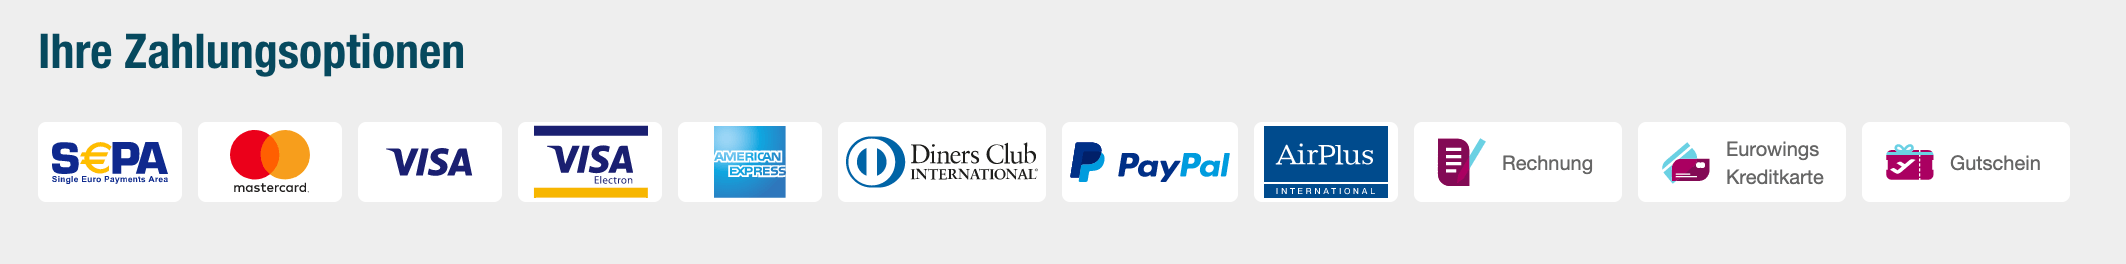 Eurowings Zahlungsmittel ohne Kreditkarte